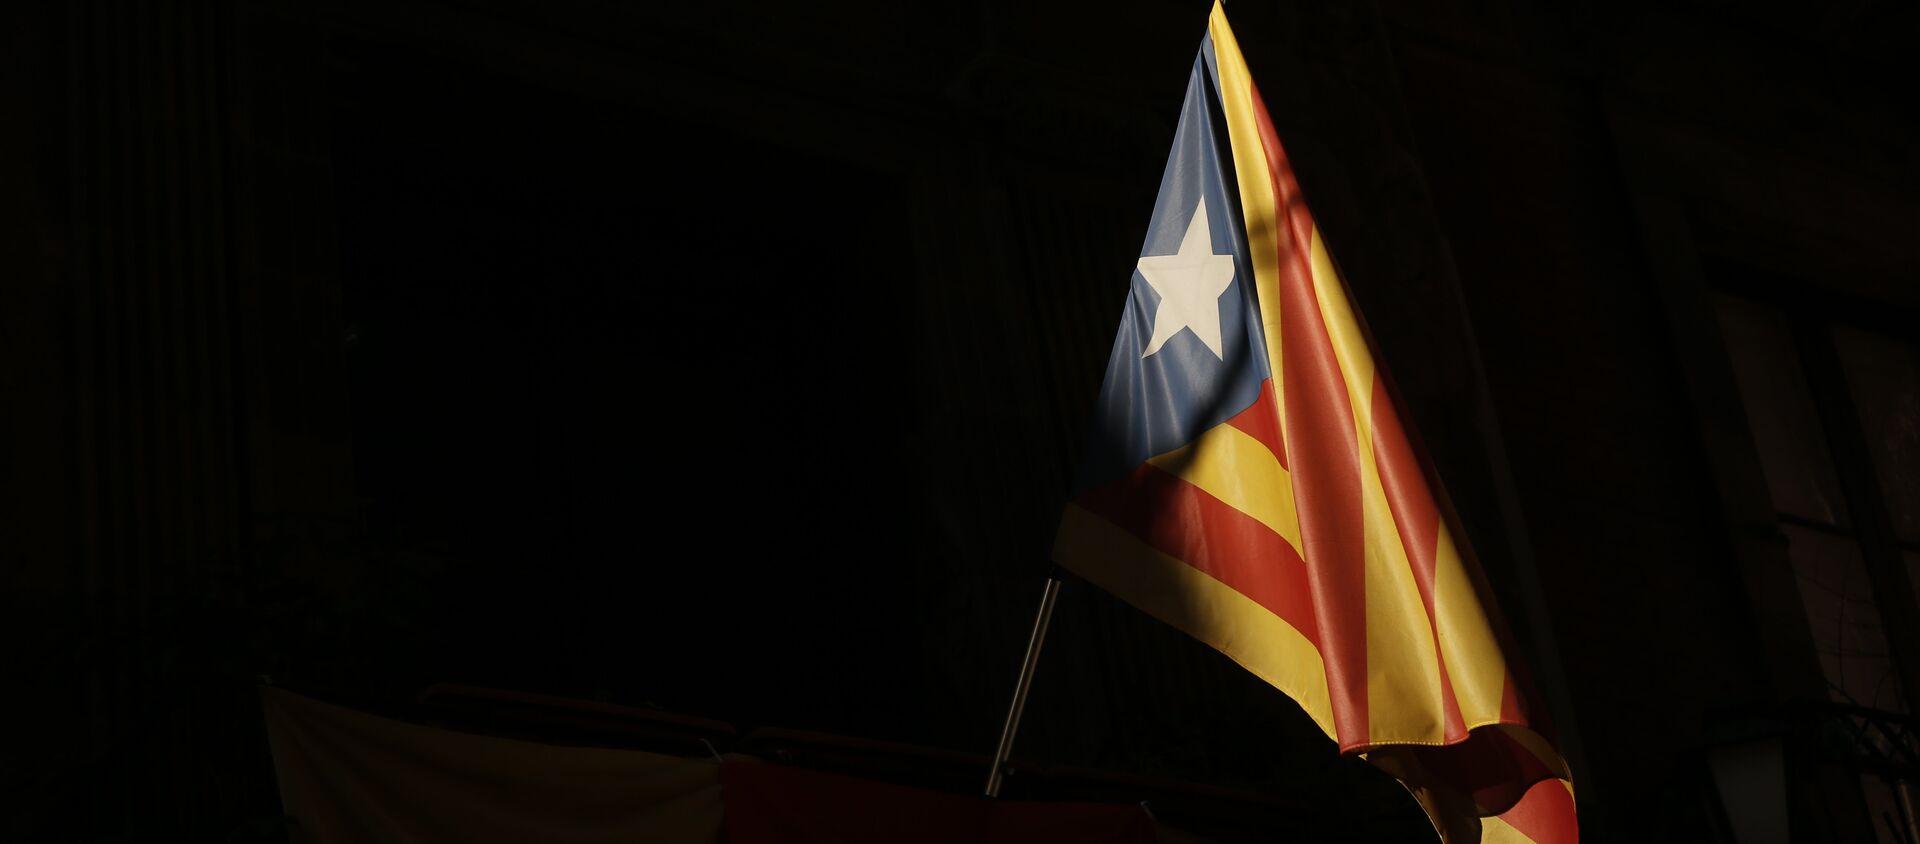 Bandera independentista catalana - Sputnik Mundo, 1920, 27.12.2020